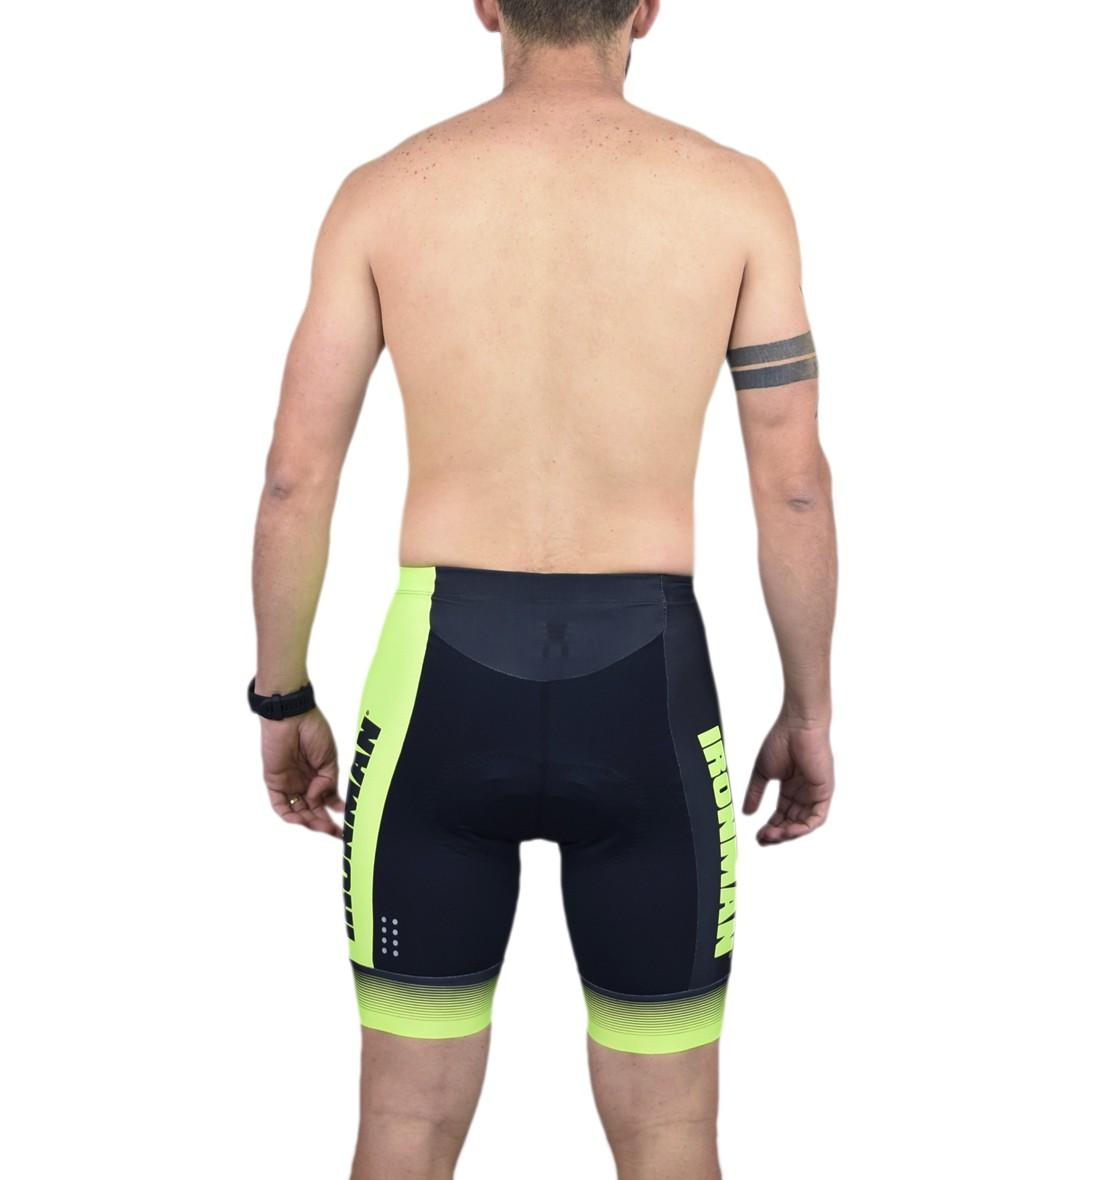 Bermuda Ciclismo Masc - Ironman - Preto